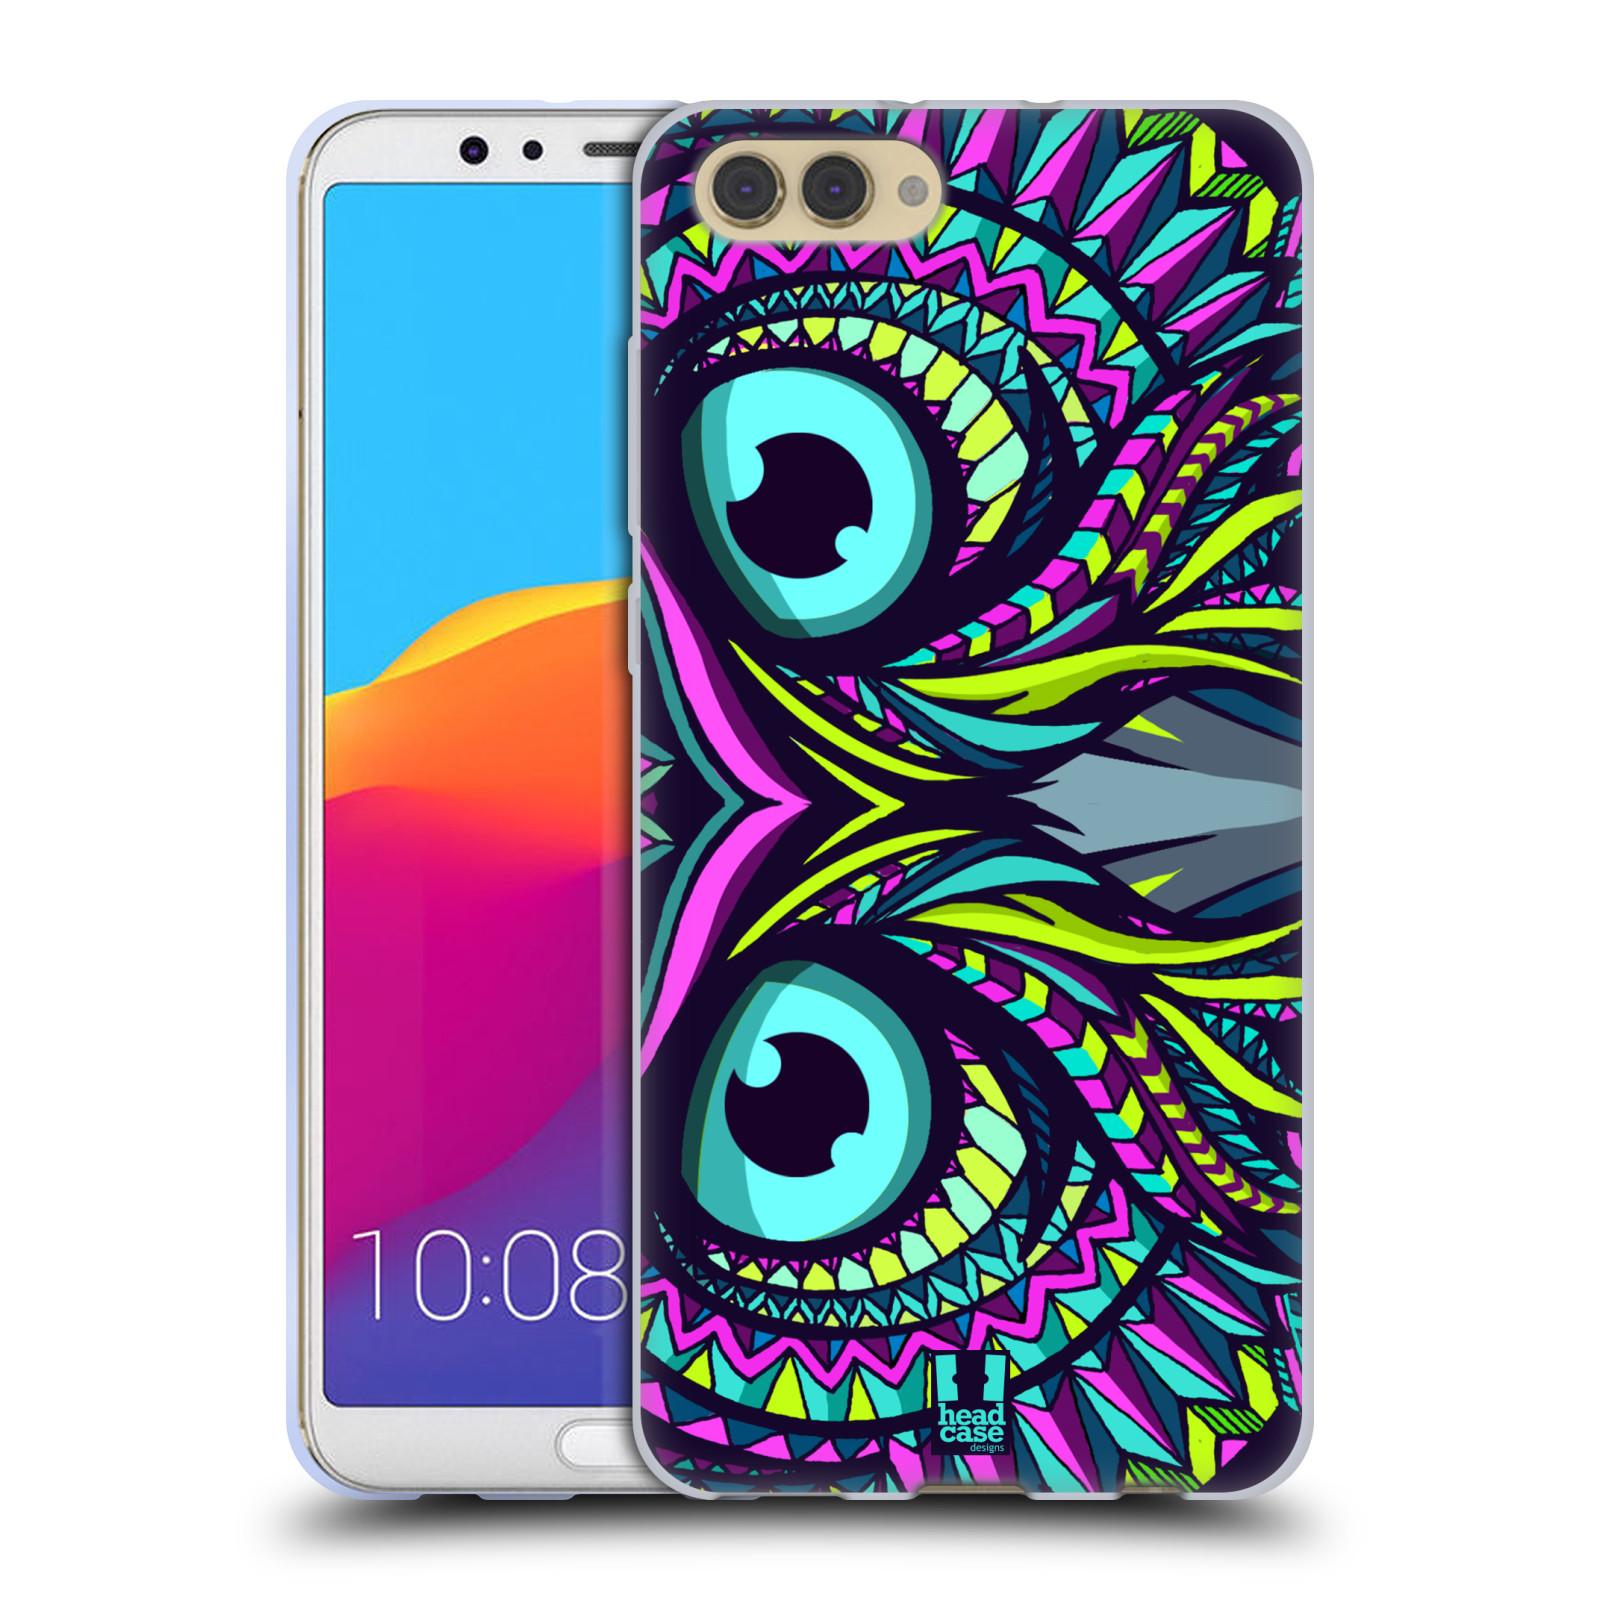 Silikonové pouzdro na mobil Honor View 10 - Head Case - AZTEC SOVA